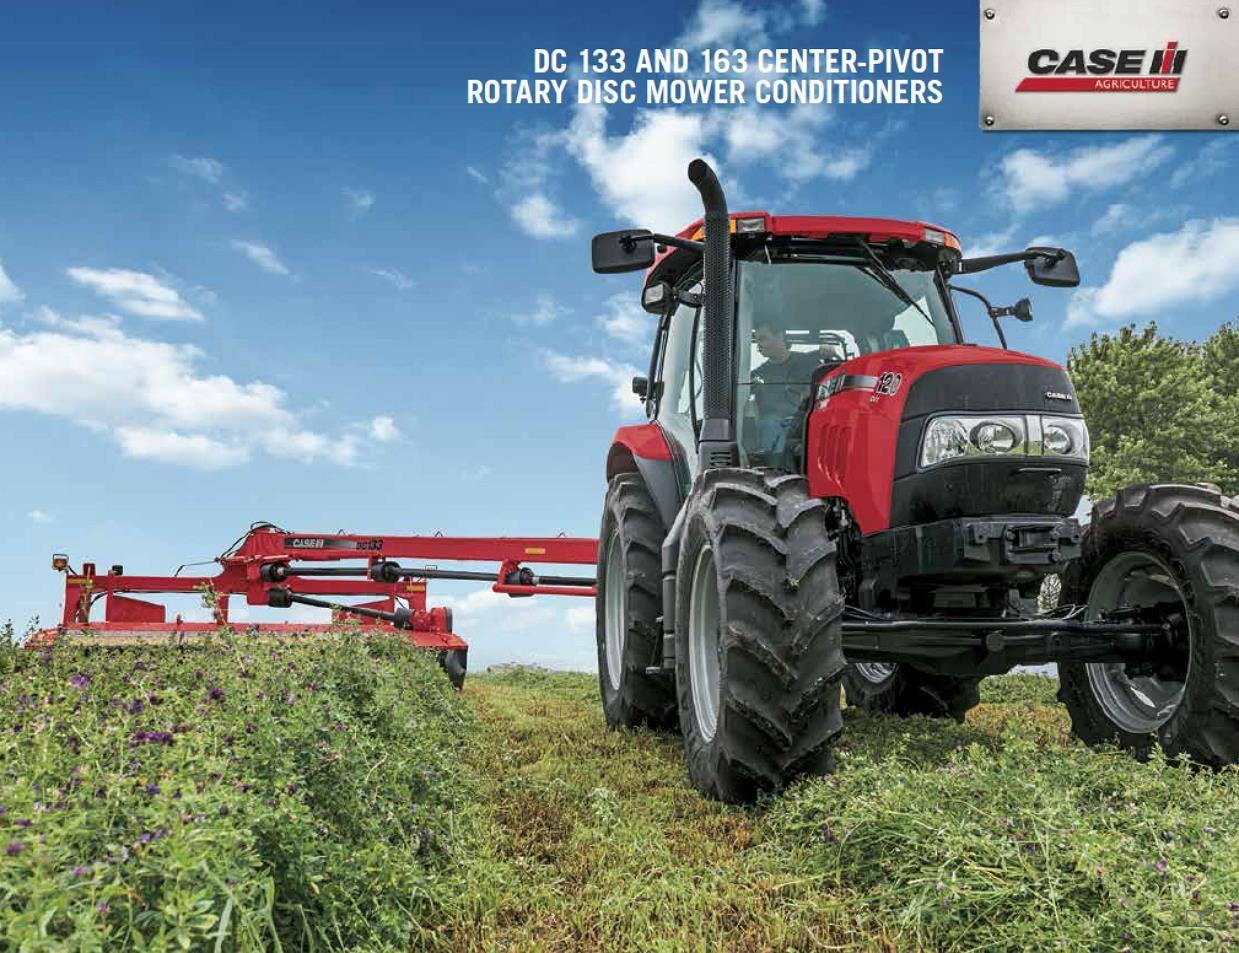 Ih 284 Tractor Wiring Diagram 350 Case Clutch Diagrams Online Tractors Elsavadorla Diesel 454